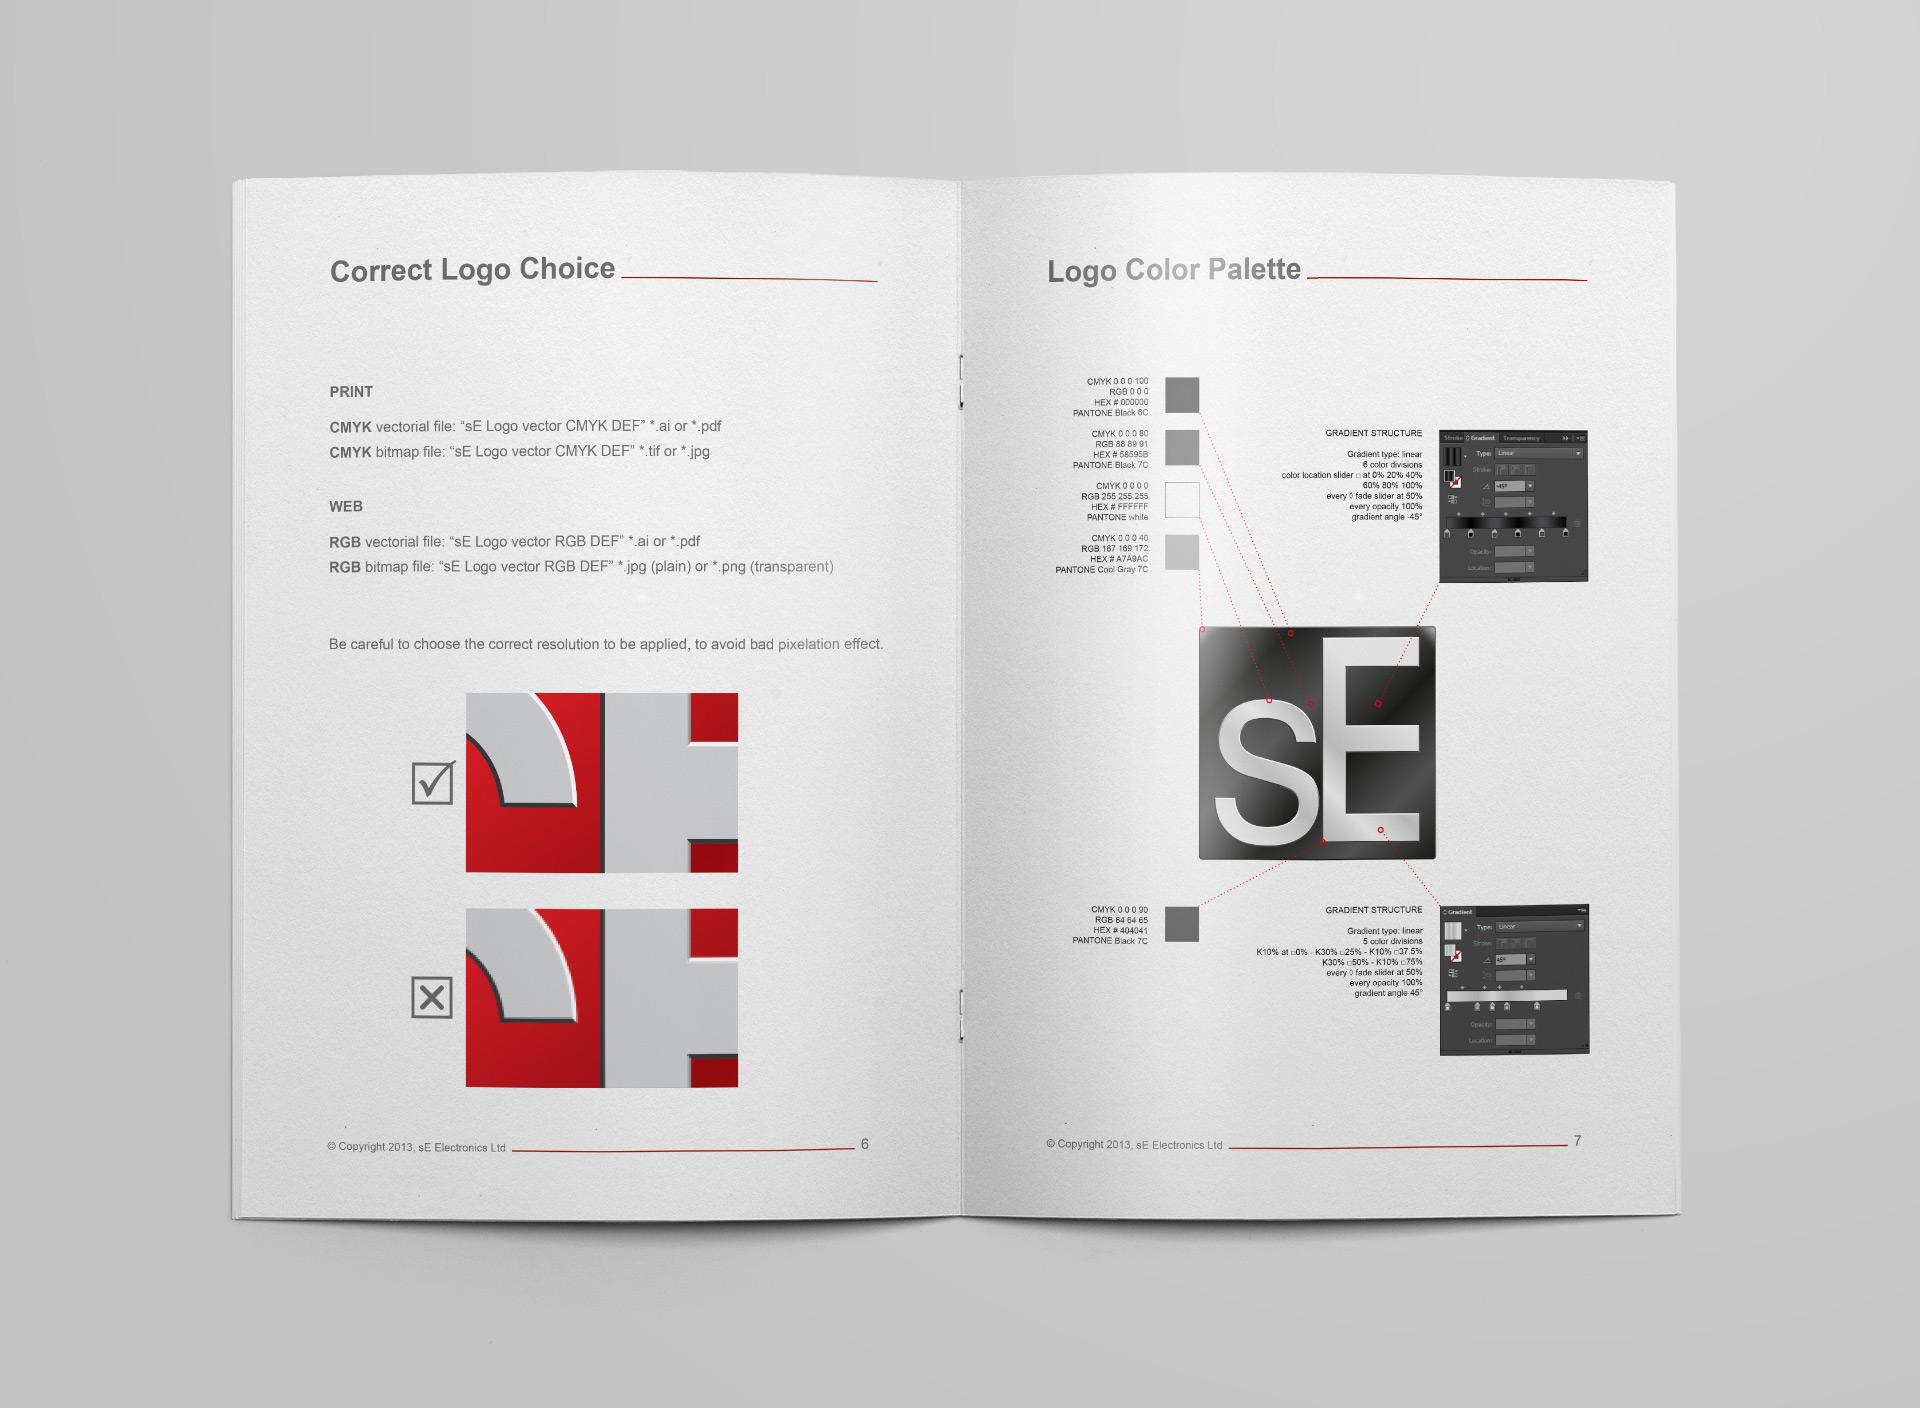 sE-guidelines-06-07